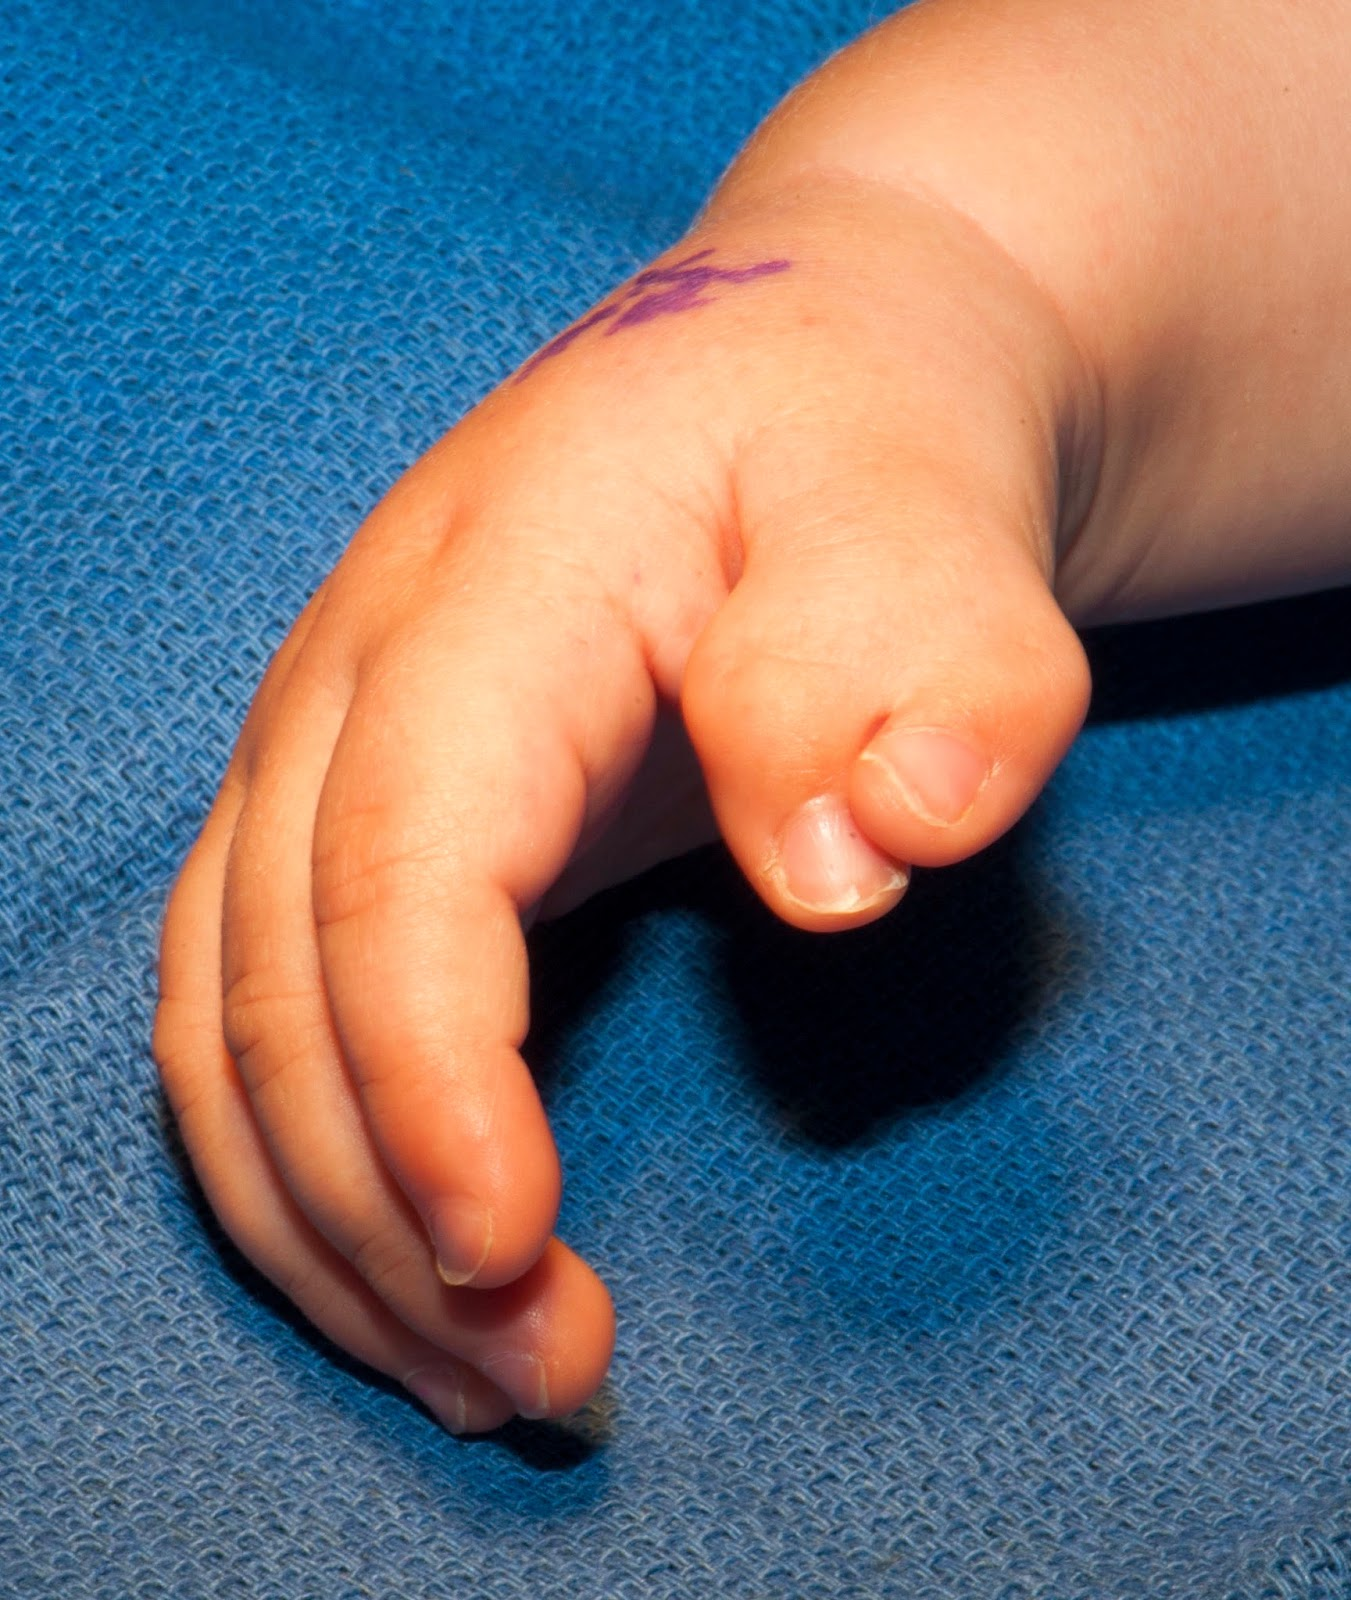 two Finger thumb